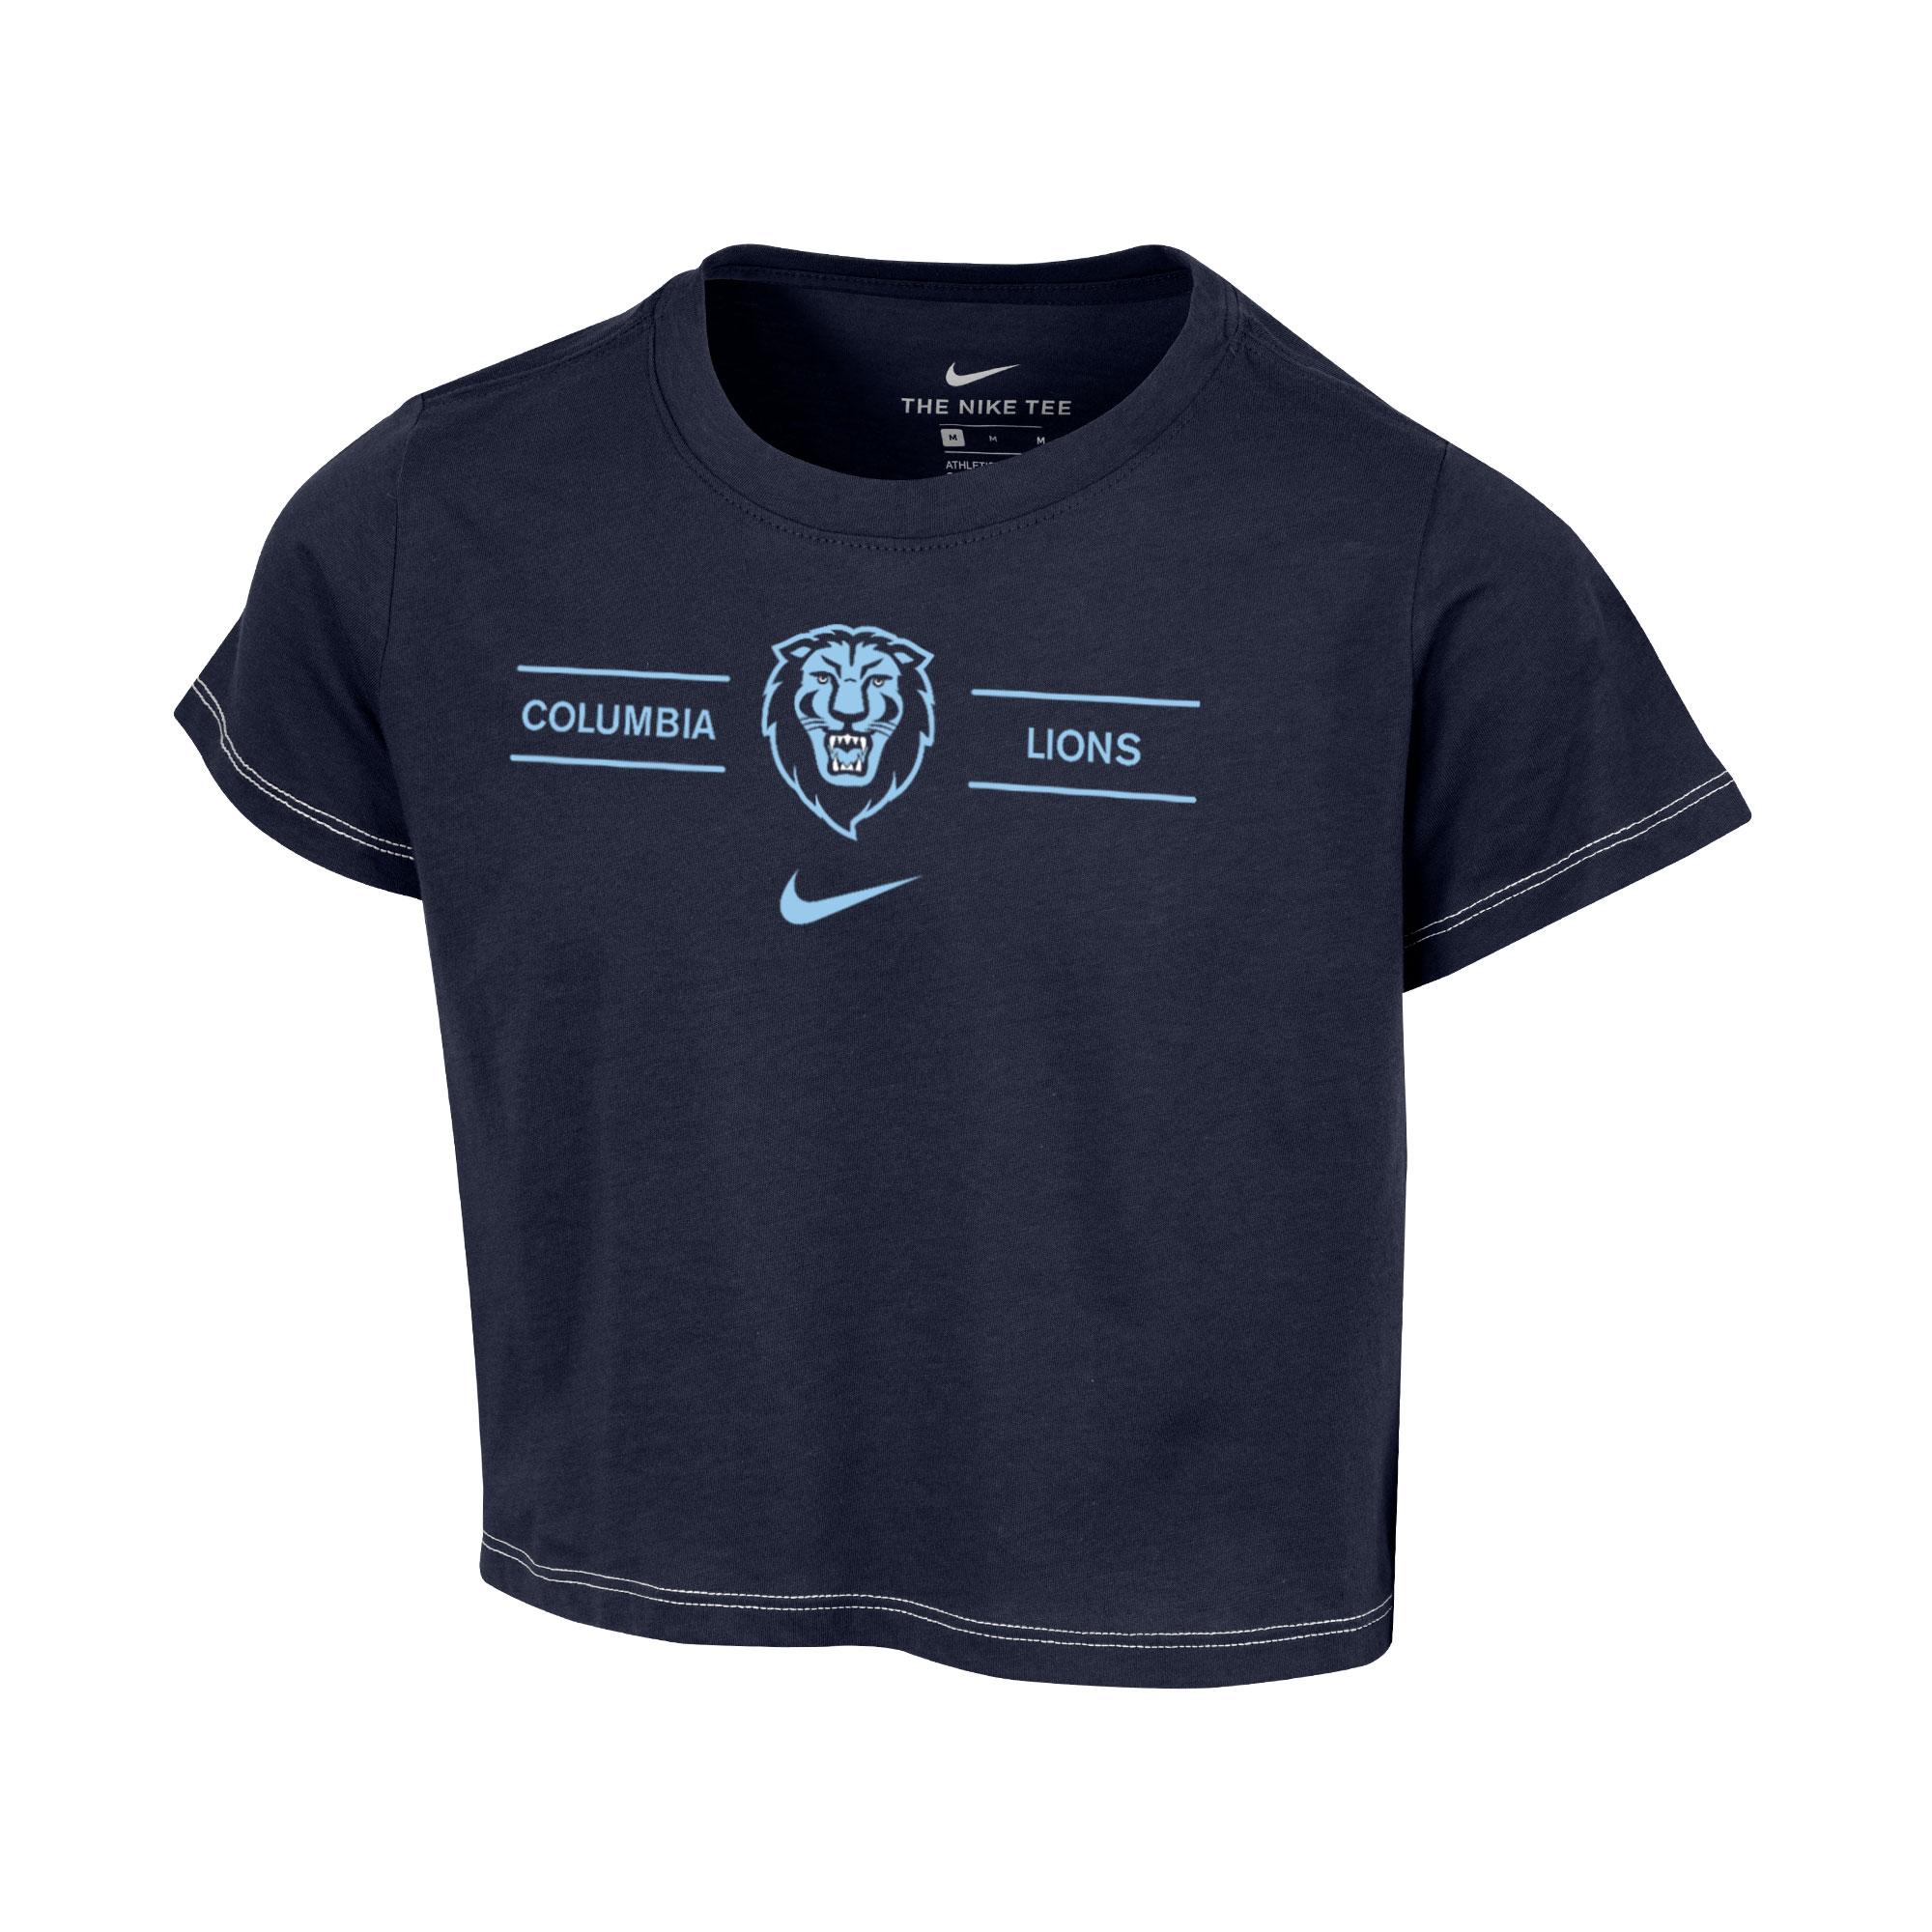 Columbia University Nike Girl's Crop Top